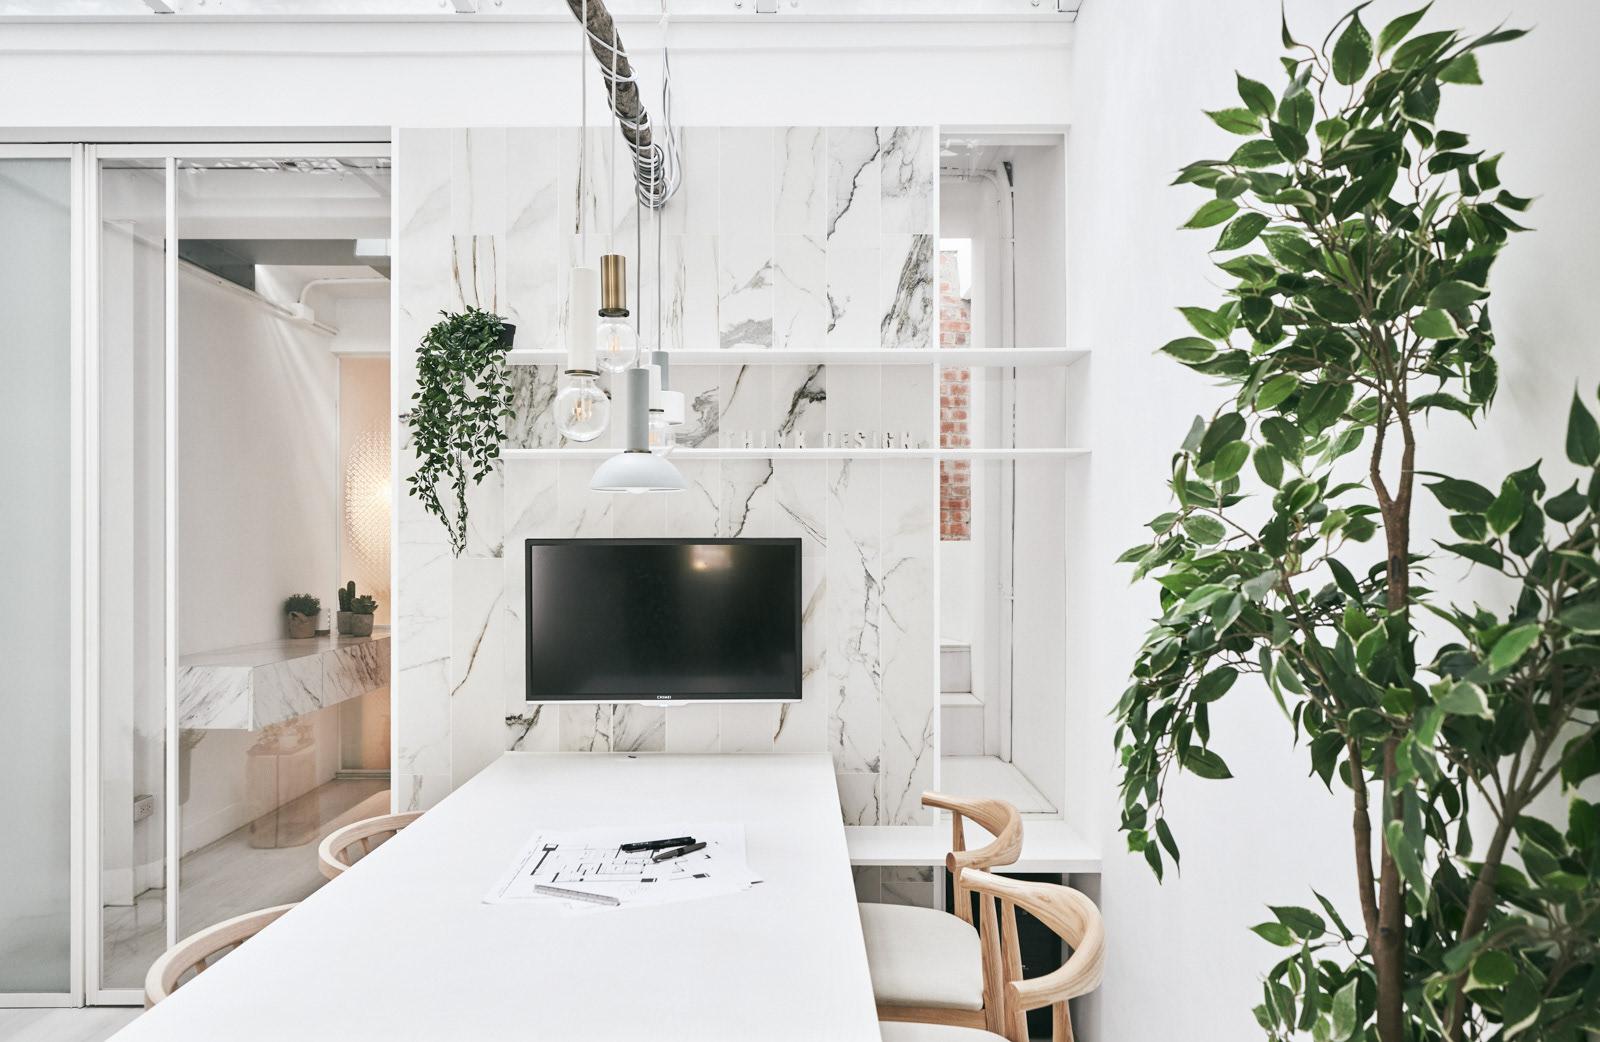 Thinking Design Office